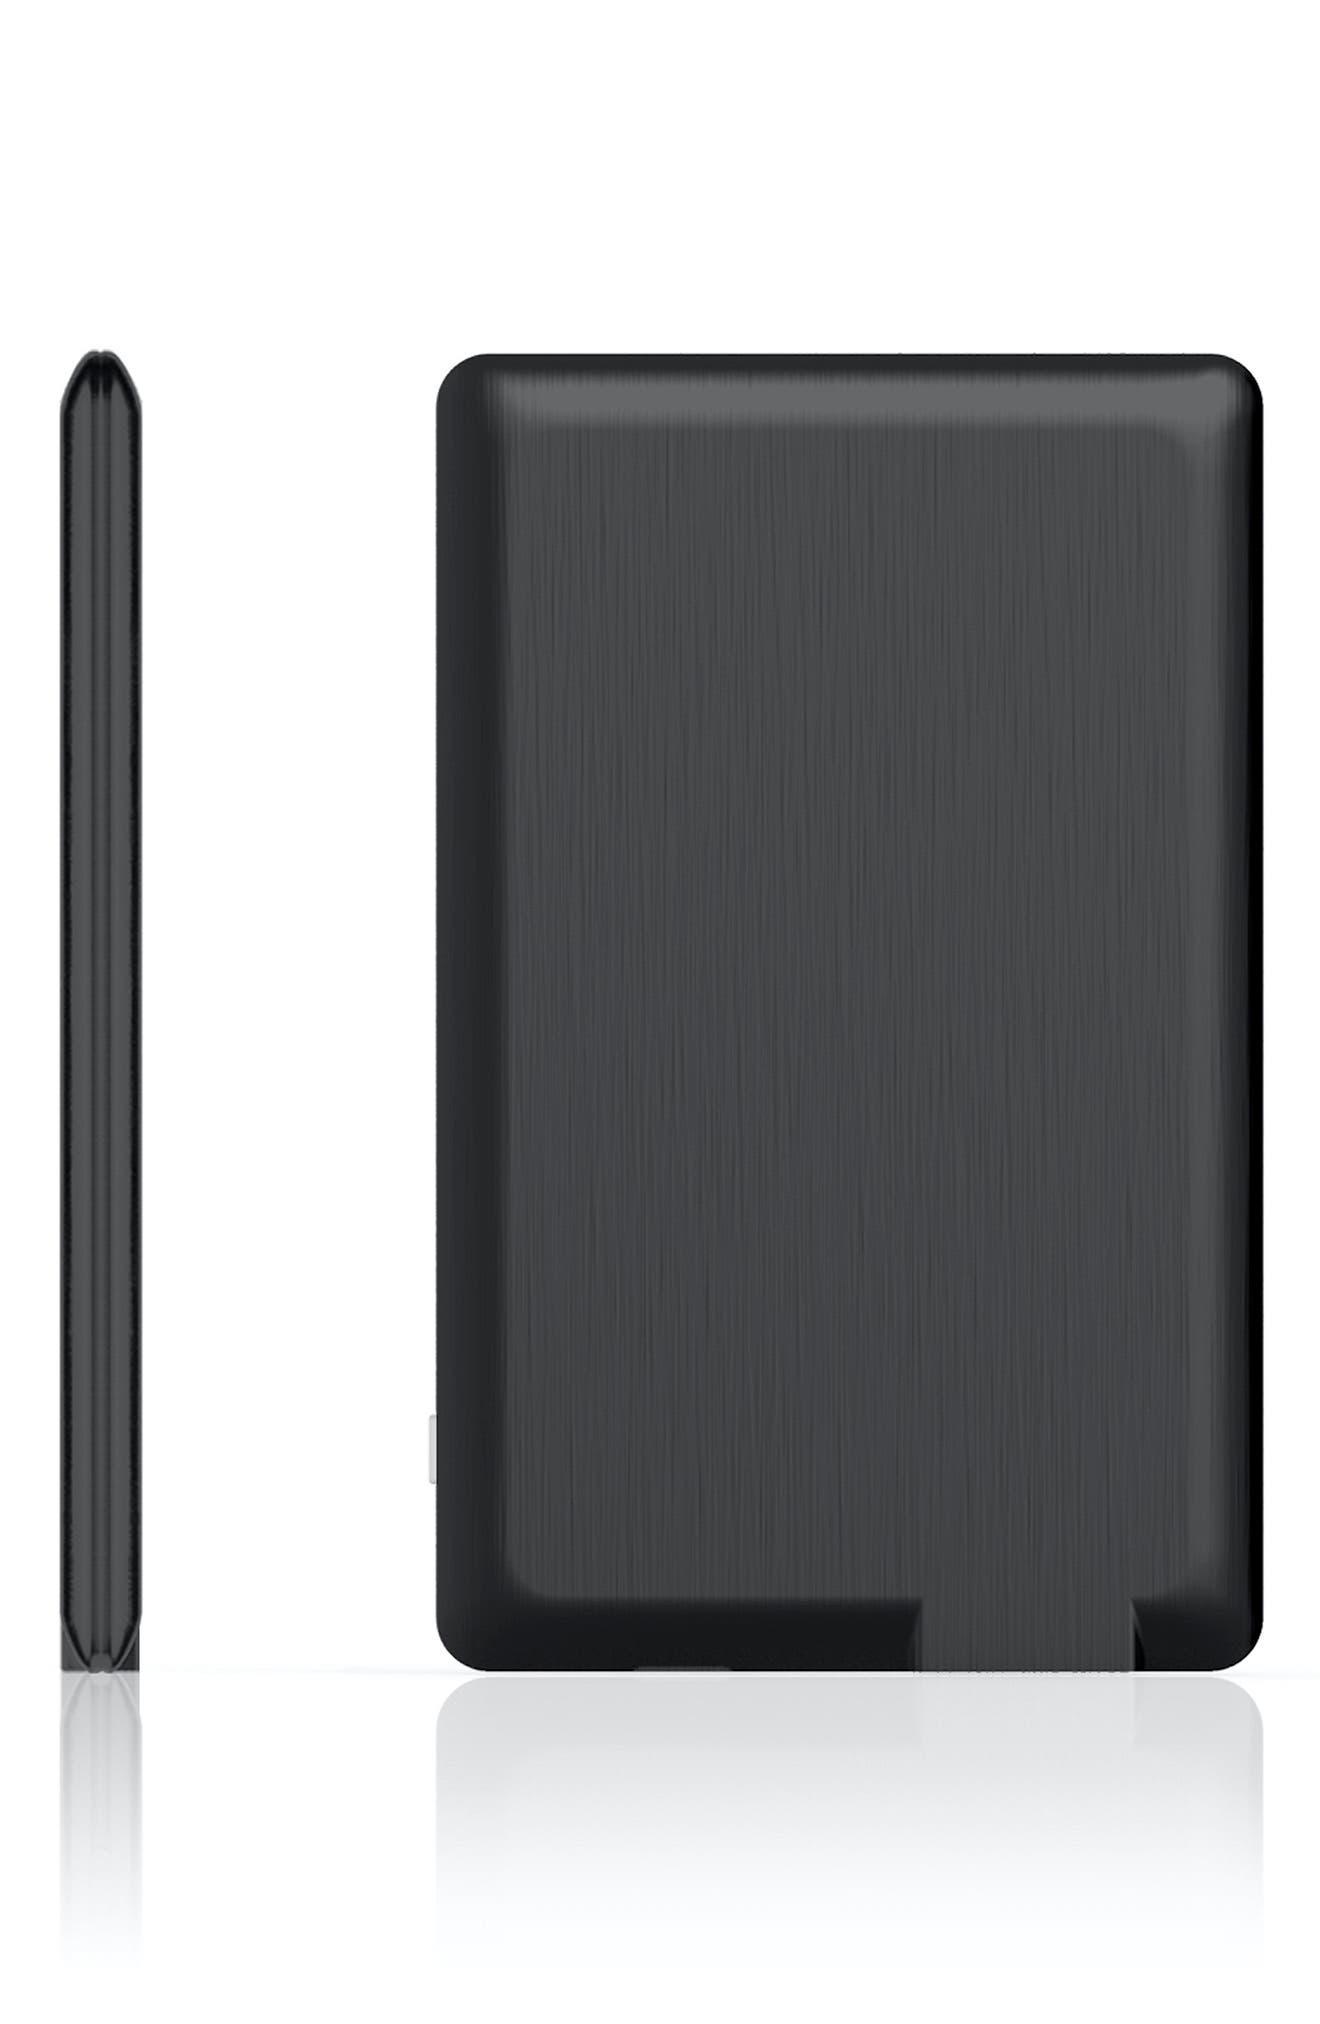 Xoopar Powercard Ultra Slim Universal Phone Power Bank, Size One Size - Black